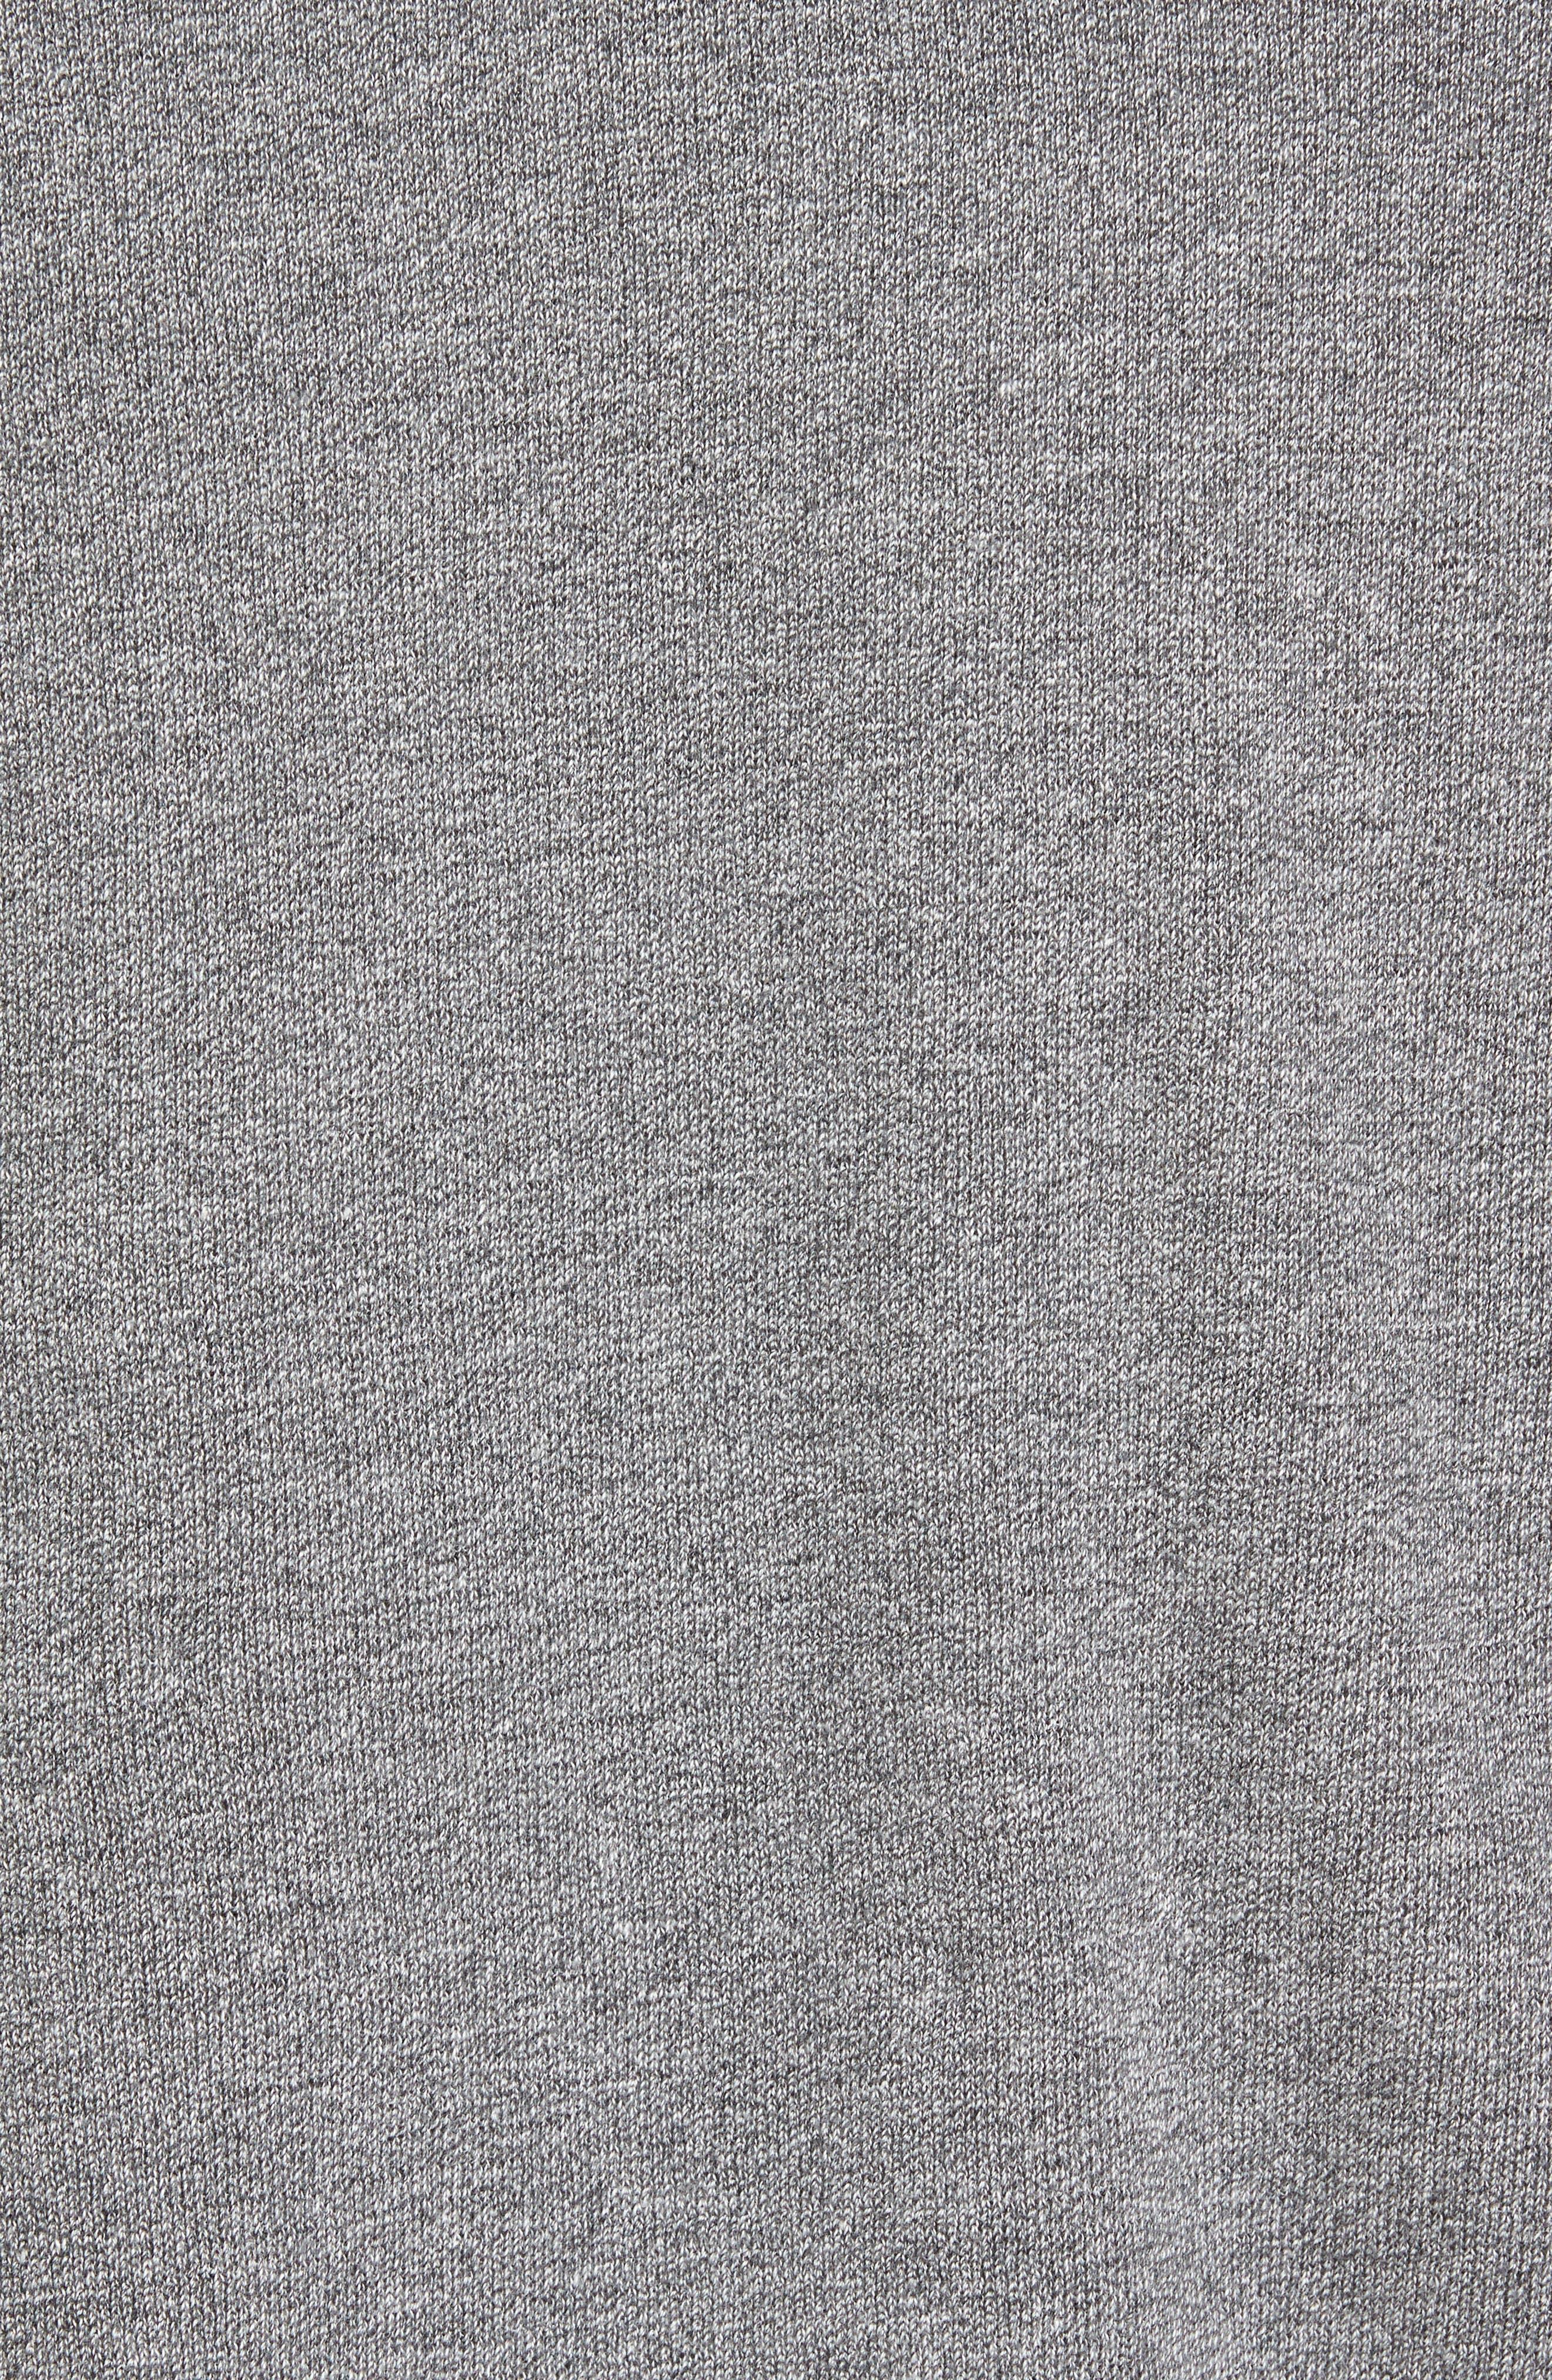 NFL Stitch of Liberty Embroidered Crewneck Sweatshirt,                             Alternate thumbnail 141, color,